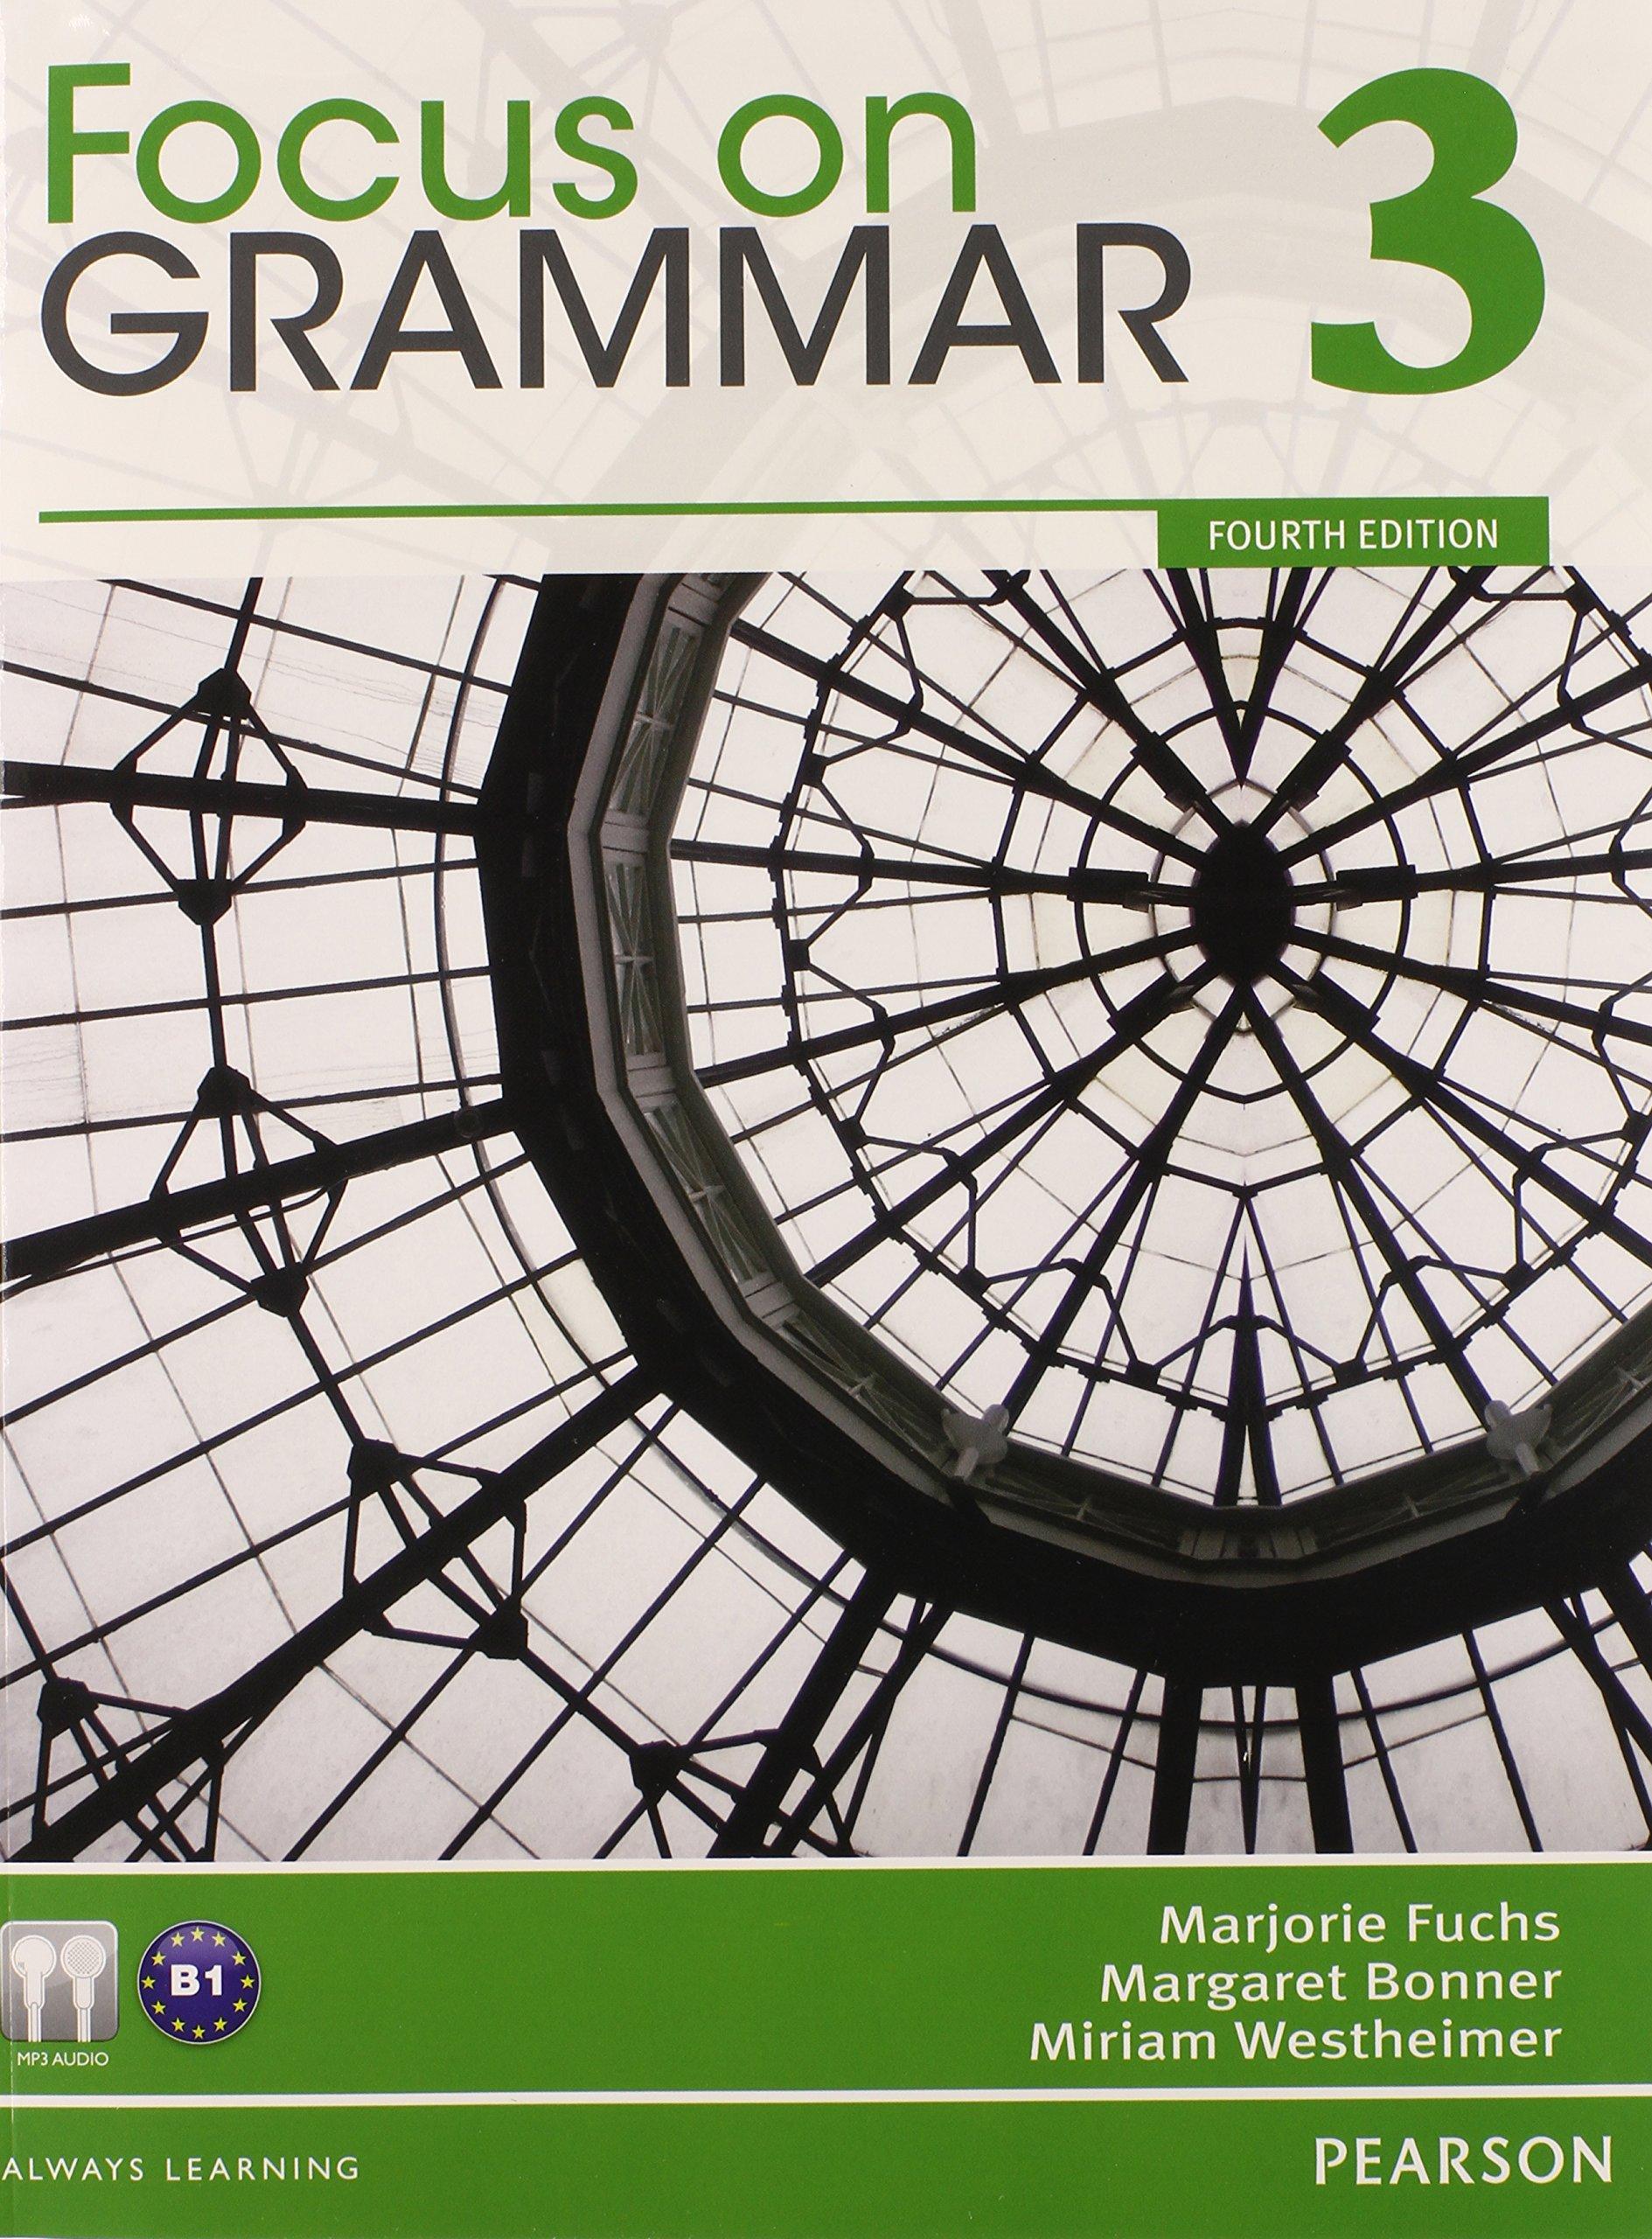 Value Pack: Focus on Grammar 3 Student Book and Workbook: Amazon.es: Fuchs, Marjorie, Bonner, Margaret, Westheimer, Miriam: Libros en idiomas extranjeros